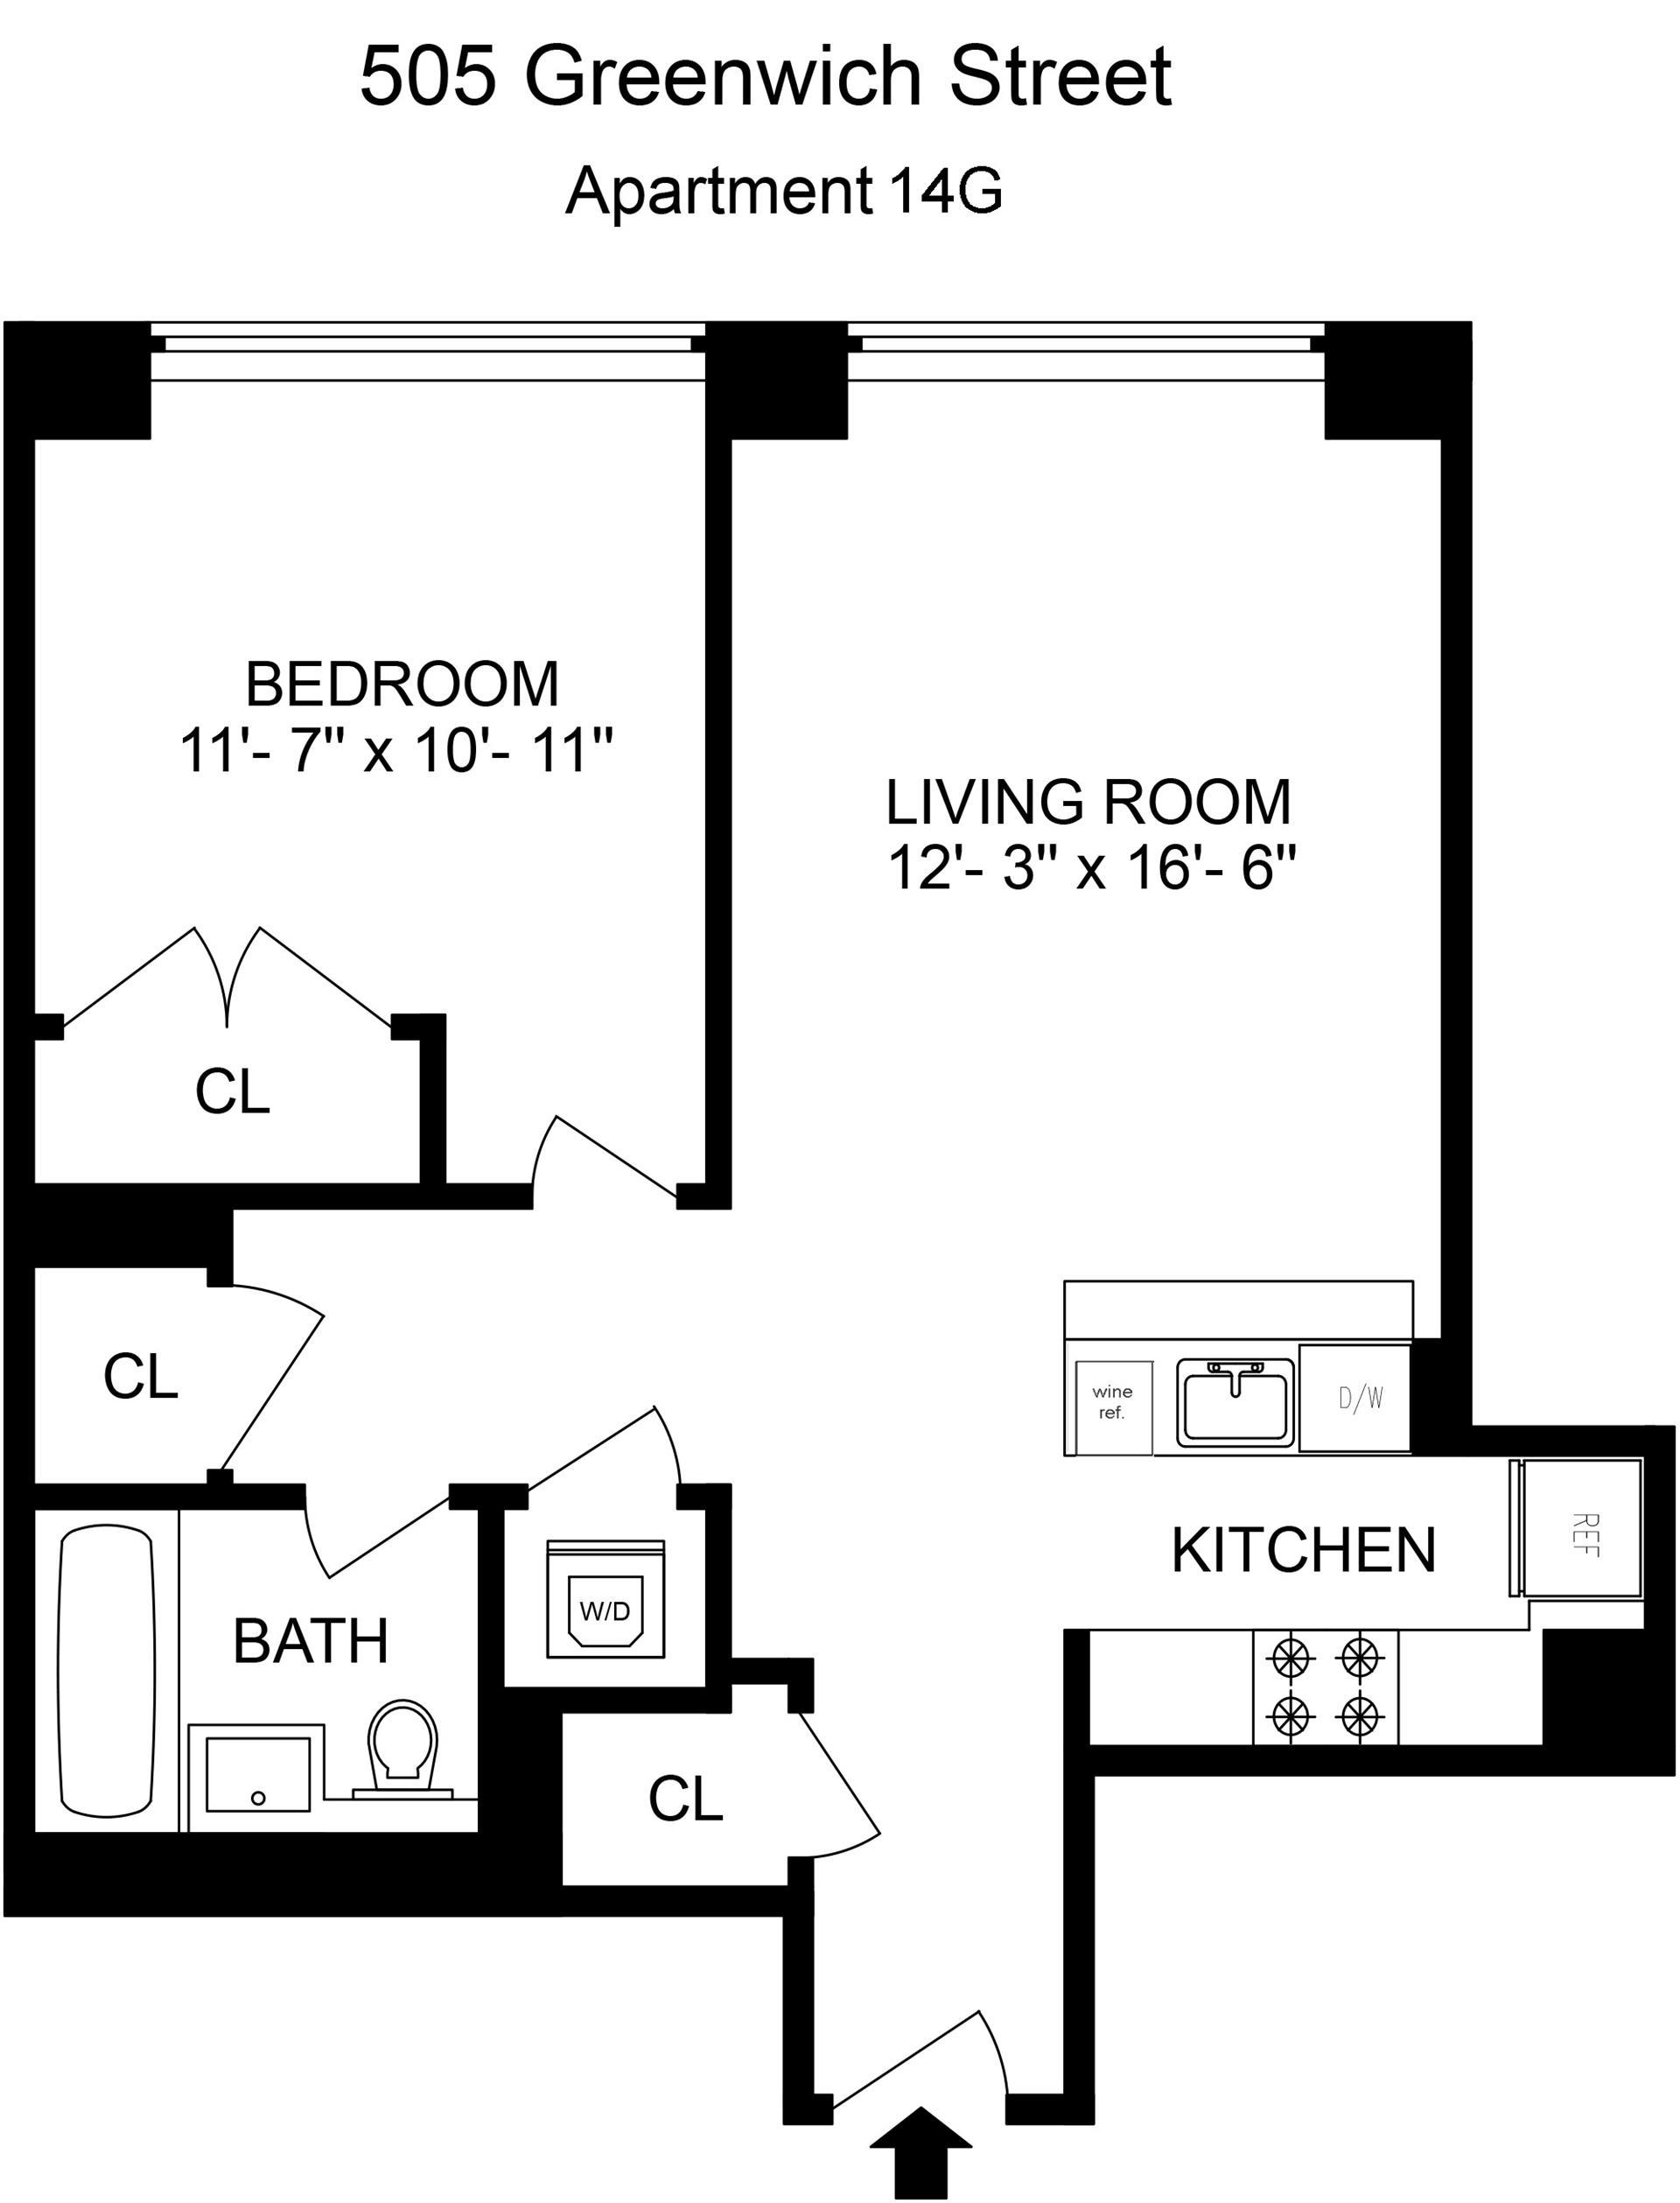 Floor plan of 505 GREENWICH, 505 Greenwich St, 14G - SoHo - Nolita, New York